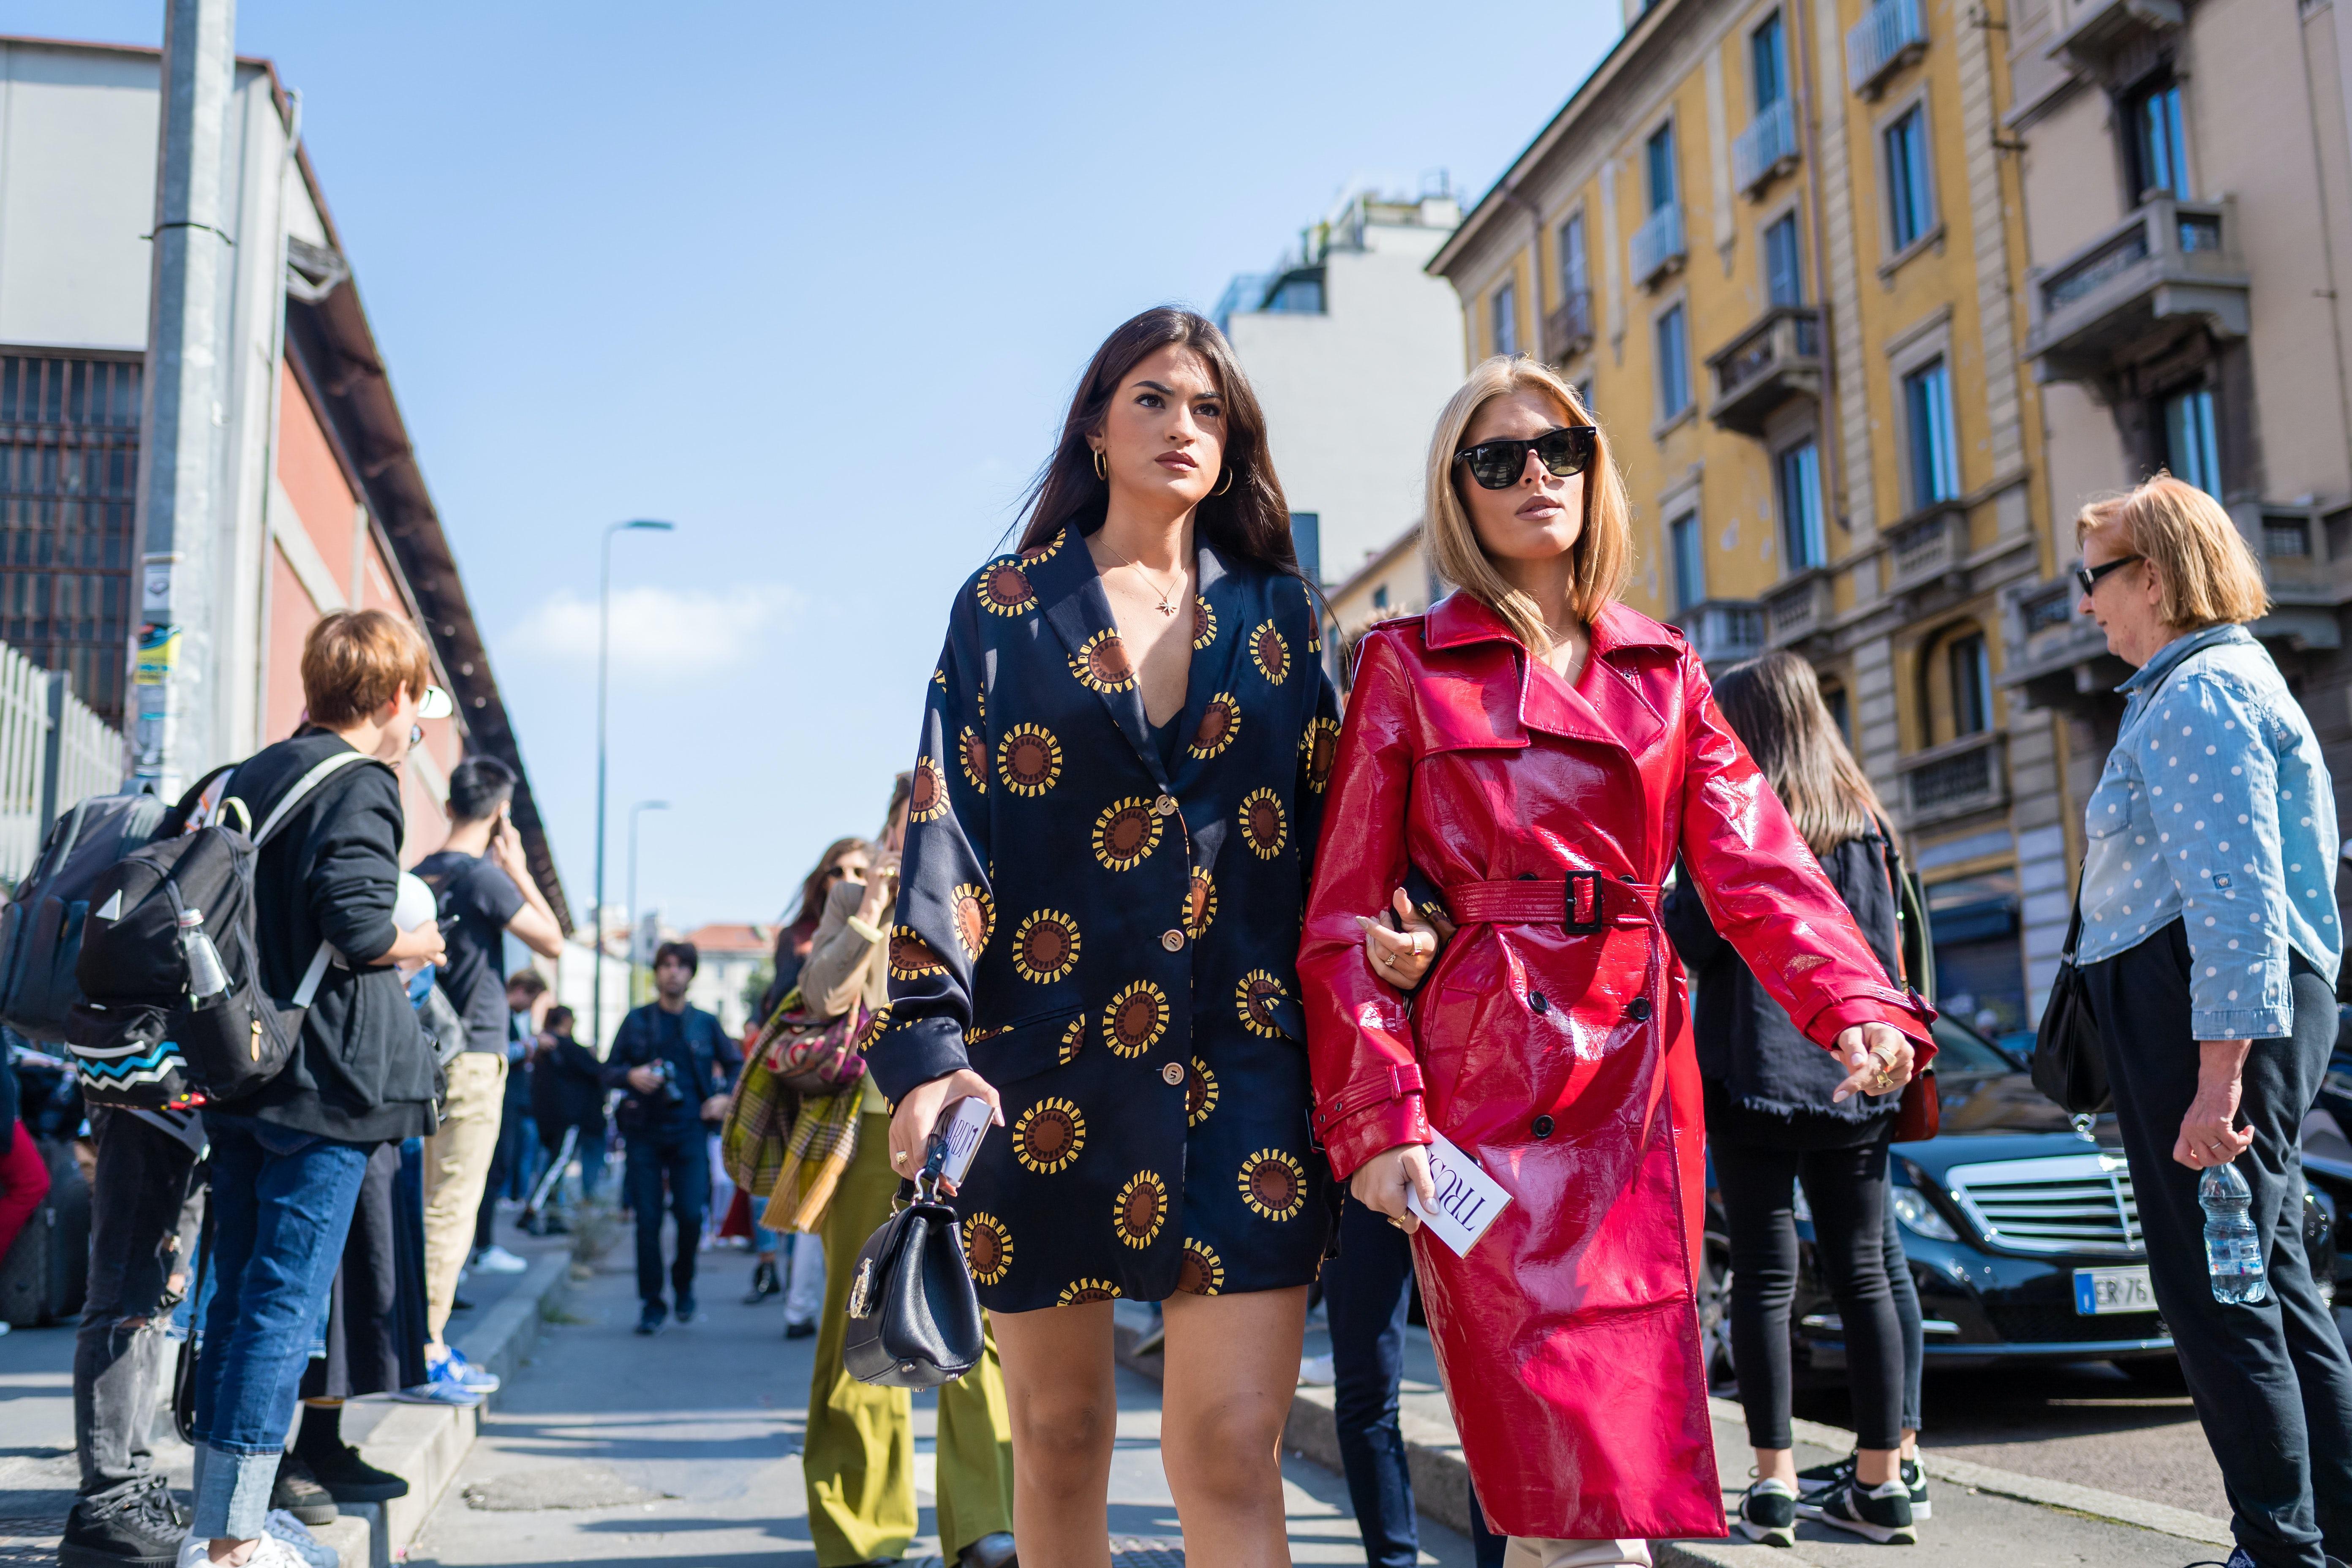 https://www.businessoffashion.com/articles/opinion/has-fashion-weeks-influencer-bubble-finally-burst